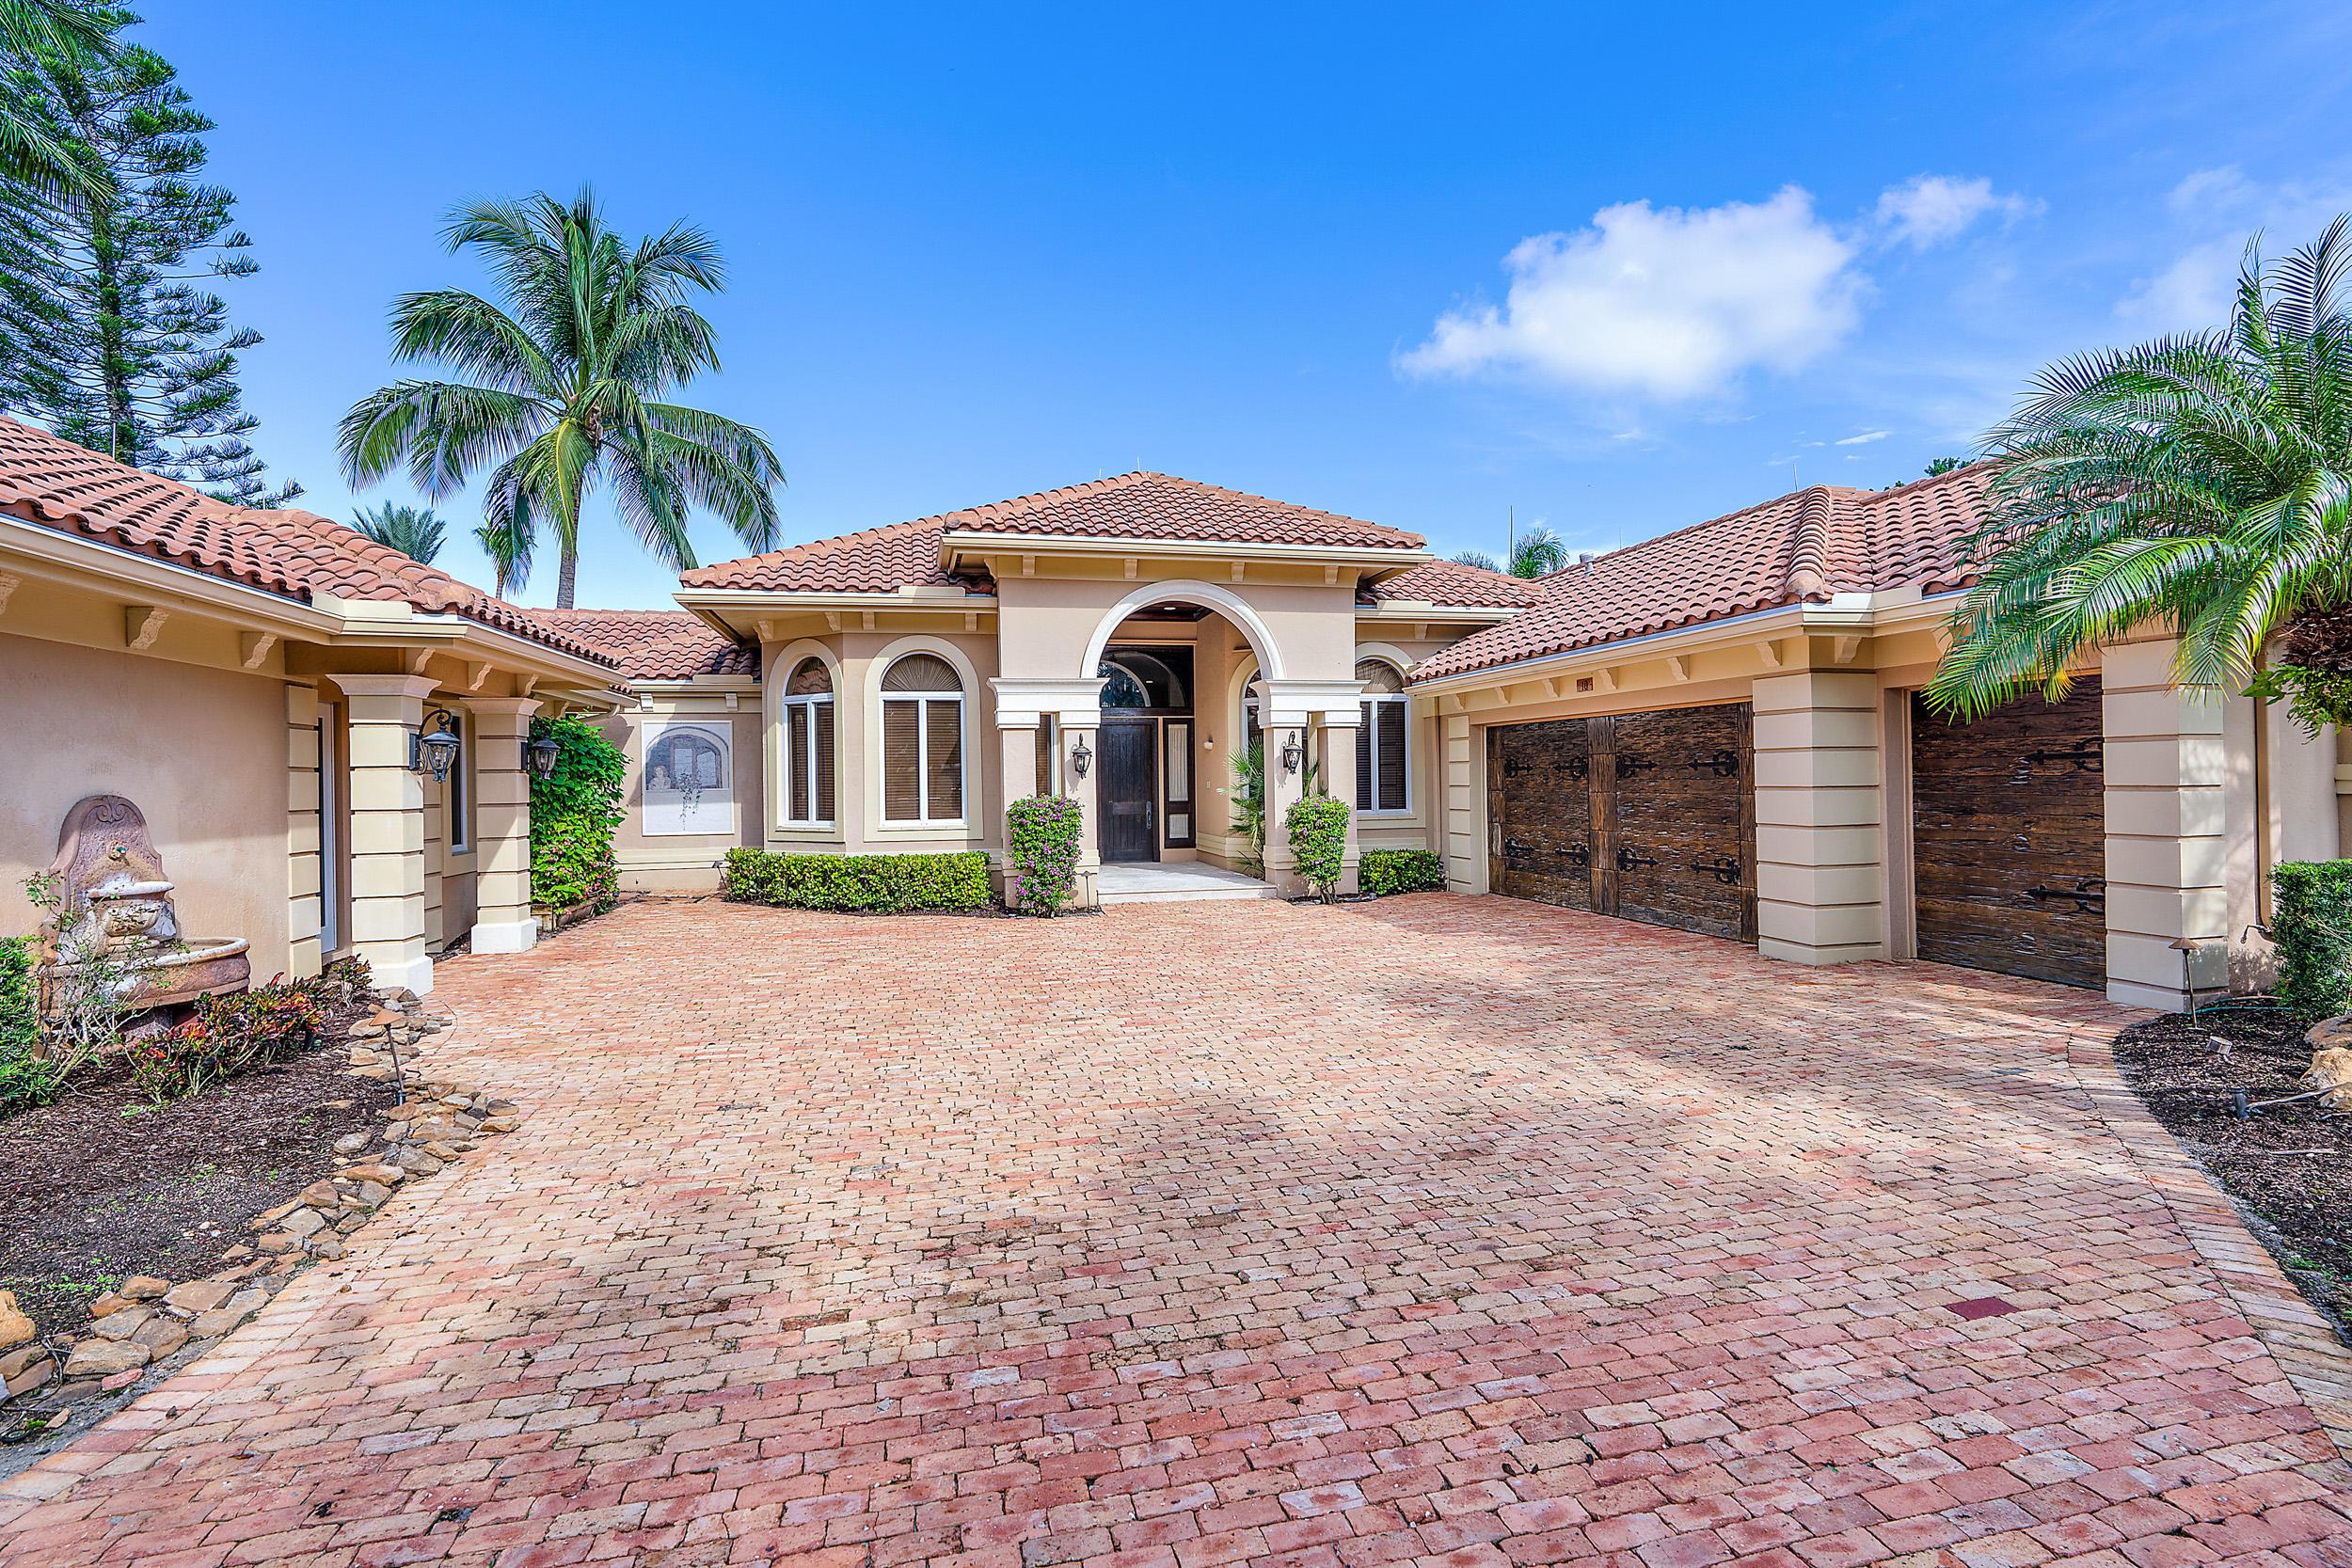 10 Saint James Drive, Palm Beach Gardens, Florida 33418, 5 Bedrooms Bedrooms, ,5 BathroomsBathrooms,F,Single family,Saint James,RX-10575348